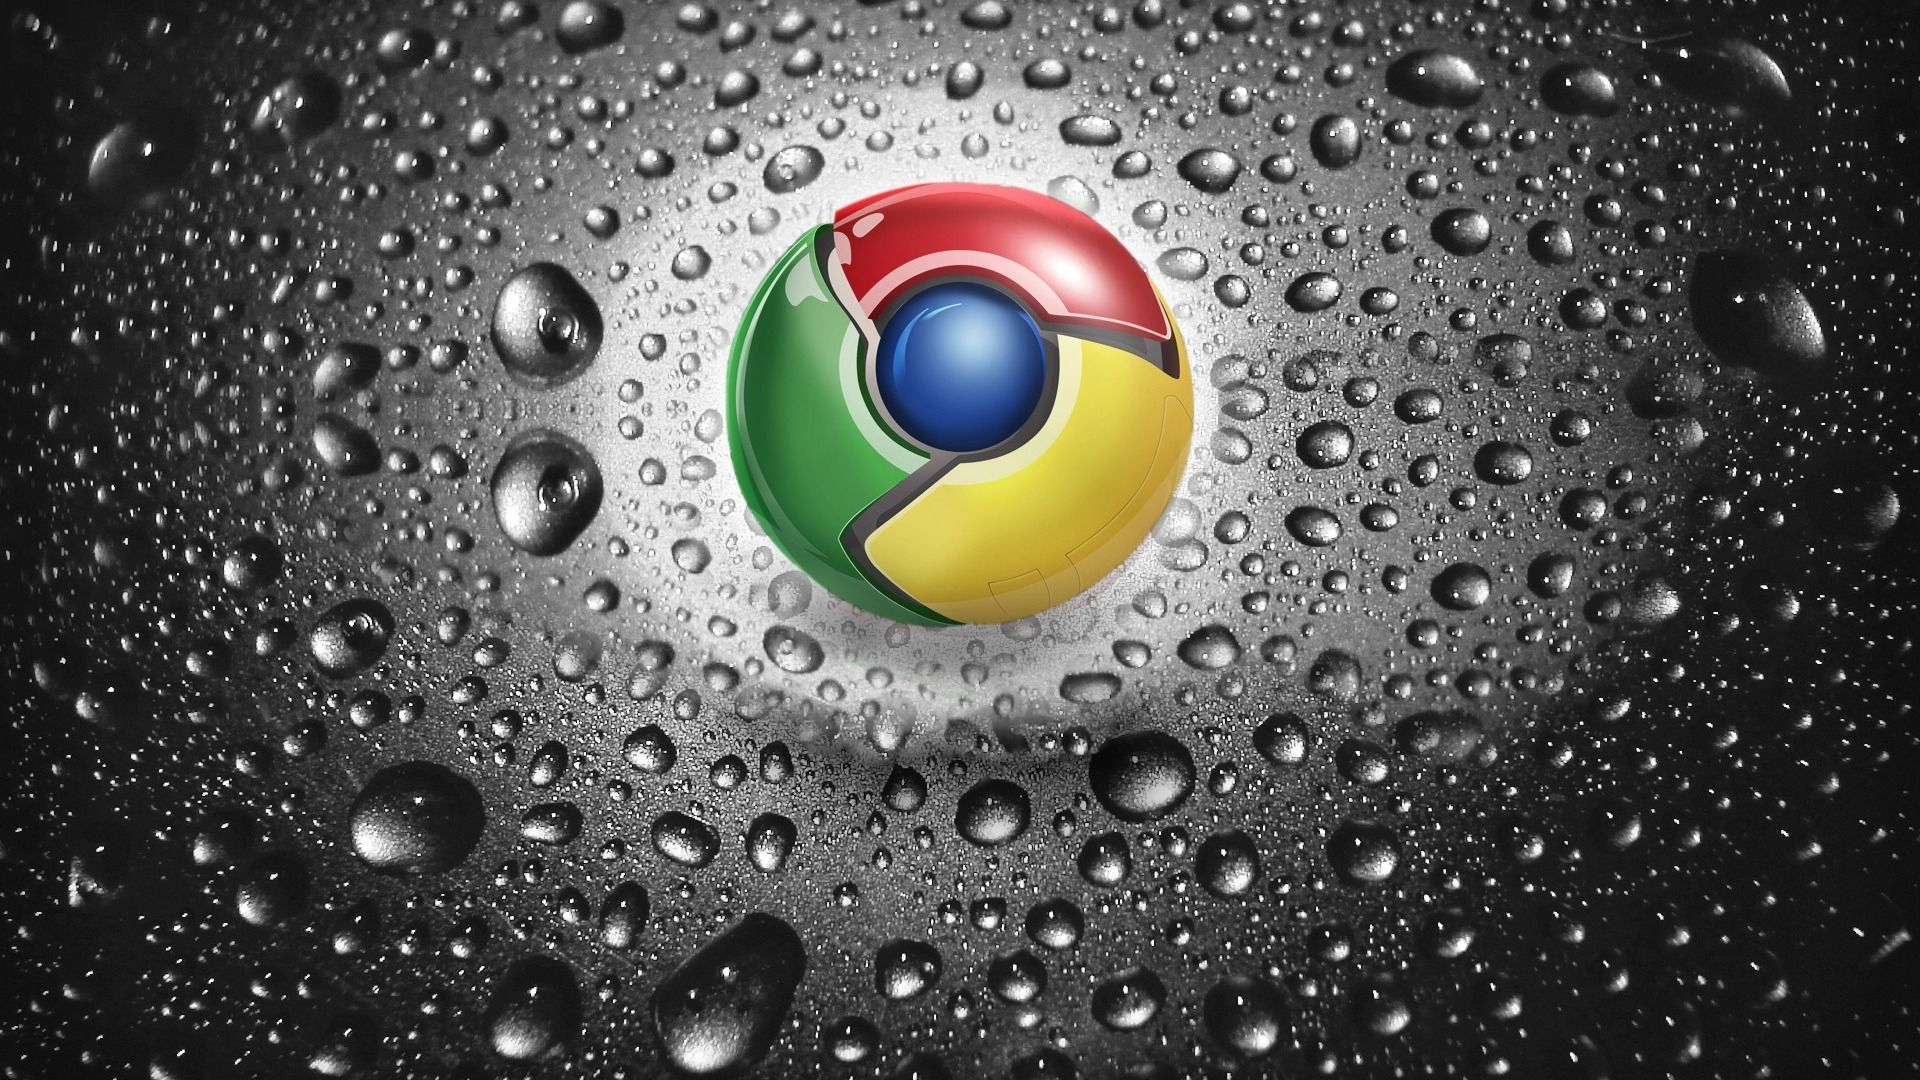 Google chrome themes yamaha - The 25 Best Ideas About Fondos Google Chrome On Pinterest Triangulo Illuminati Motos Harley Davidson And Motos